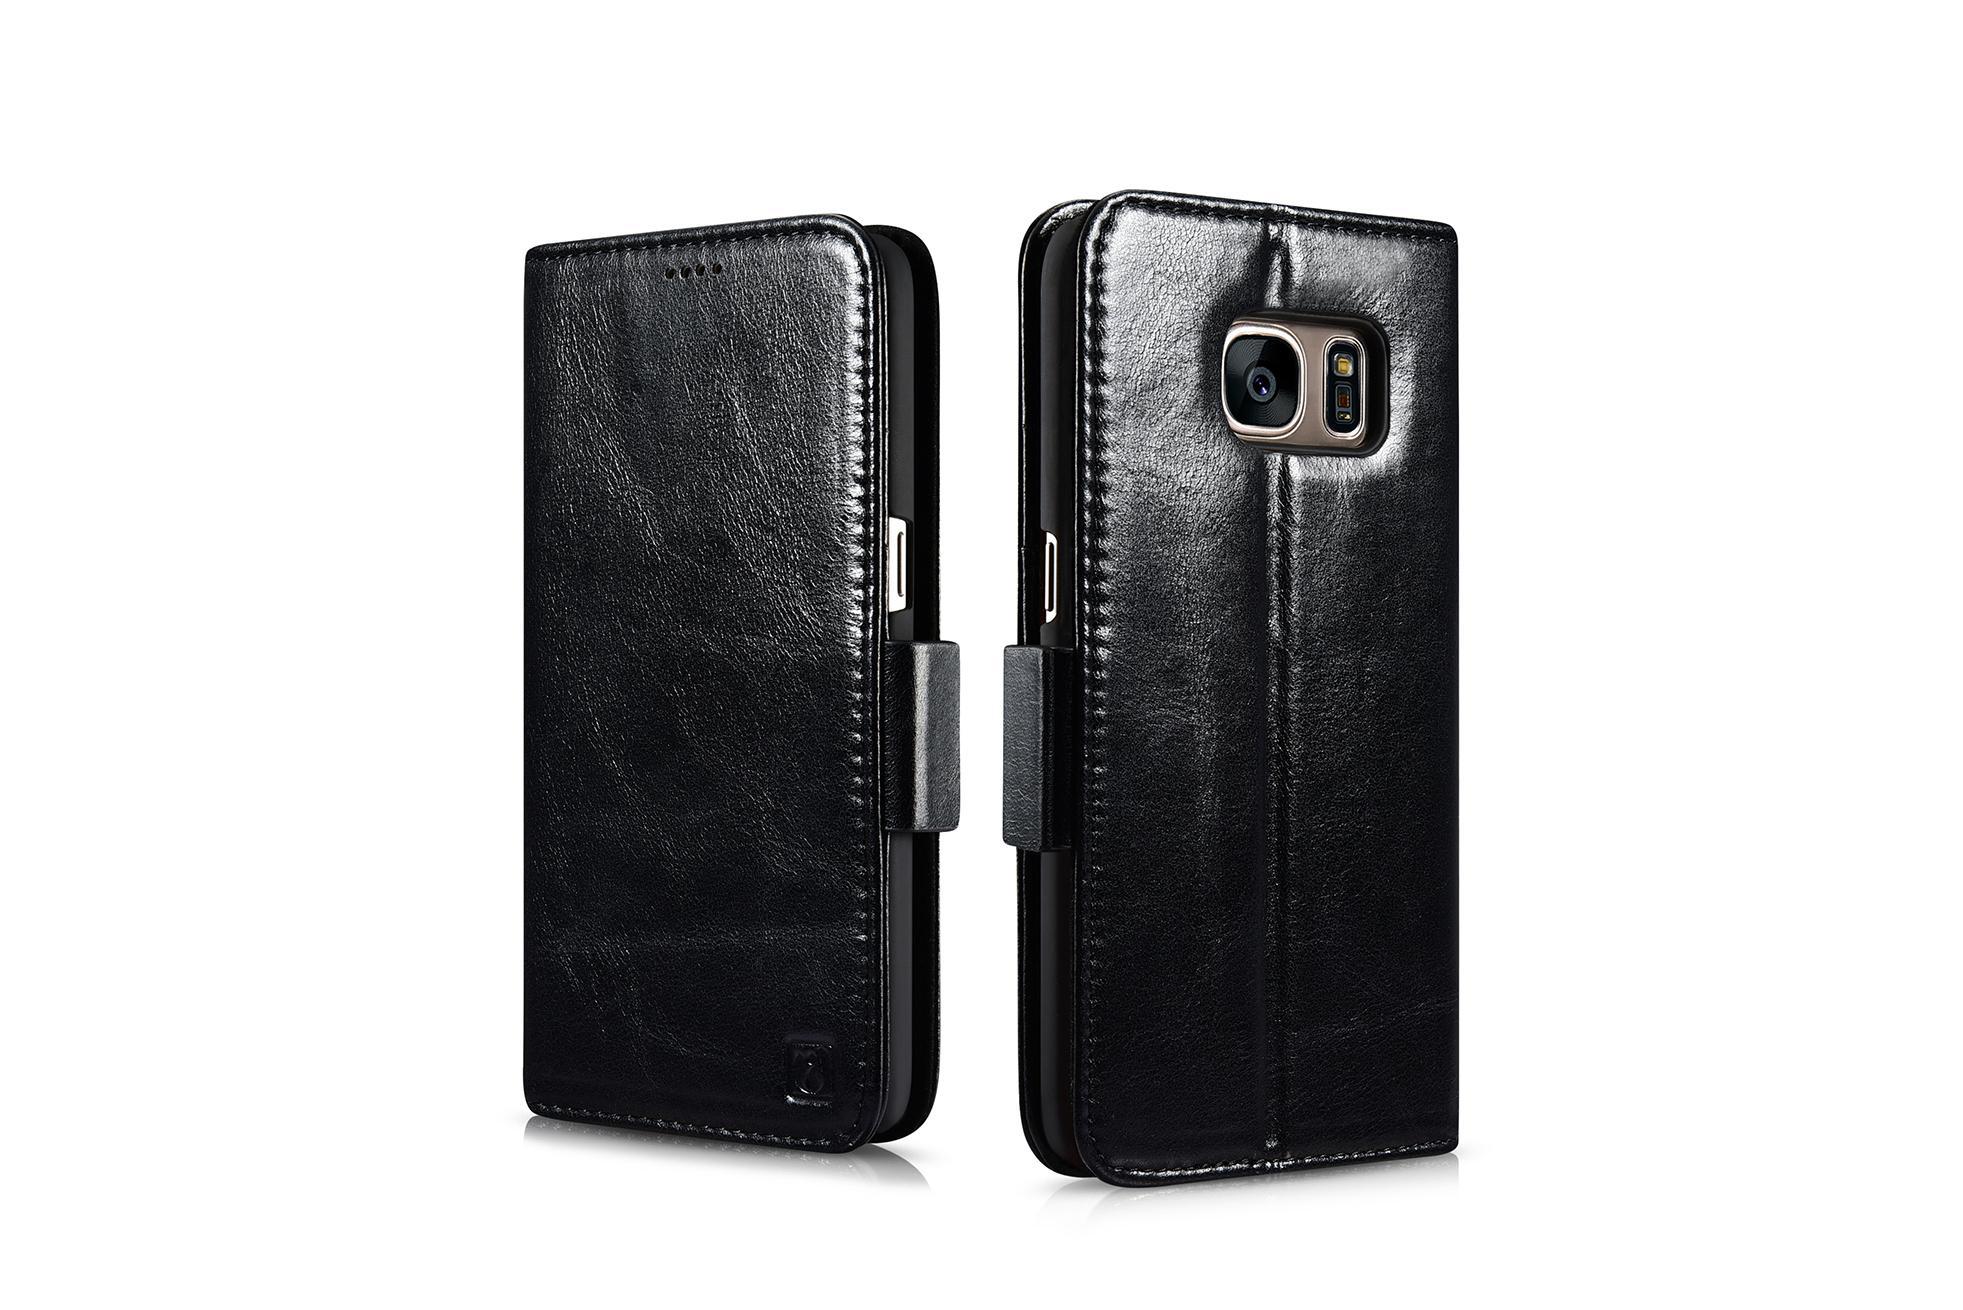 iCarer Samsung Galaxy S7 Silmarillion Leather Detachable 2in1 Wallet Folio Case 19